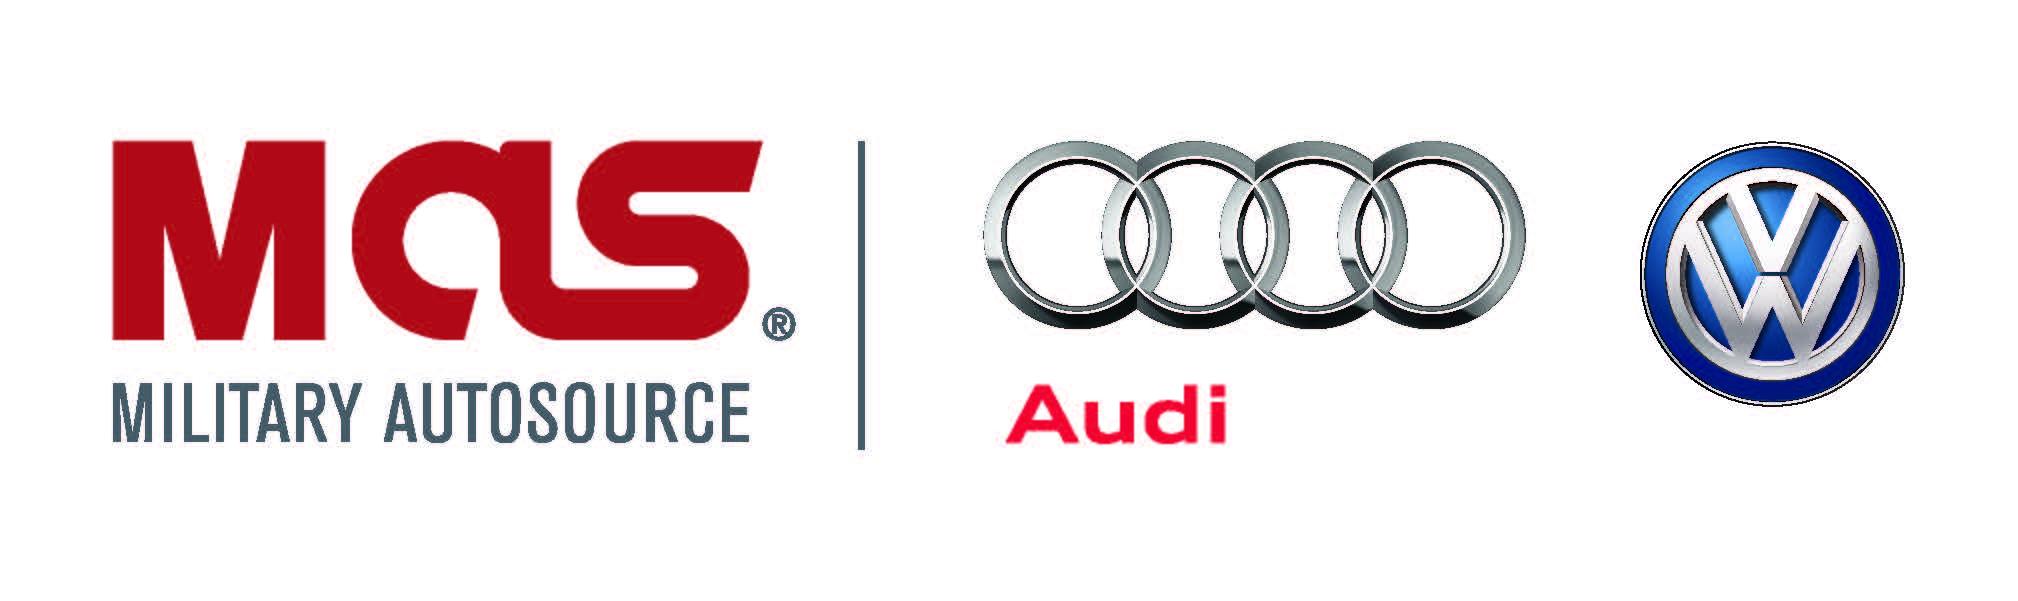 AX8753_MWR_Logos 6-Audi-VW.jpg